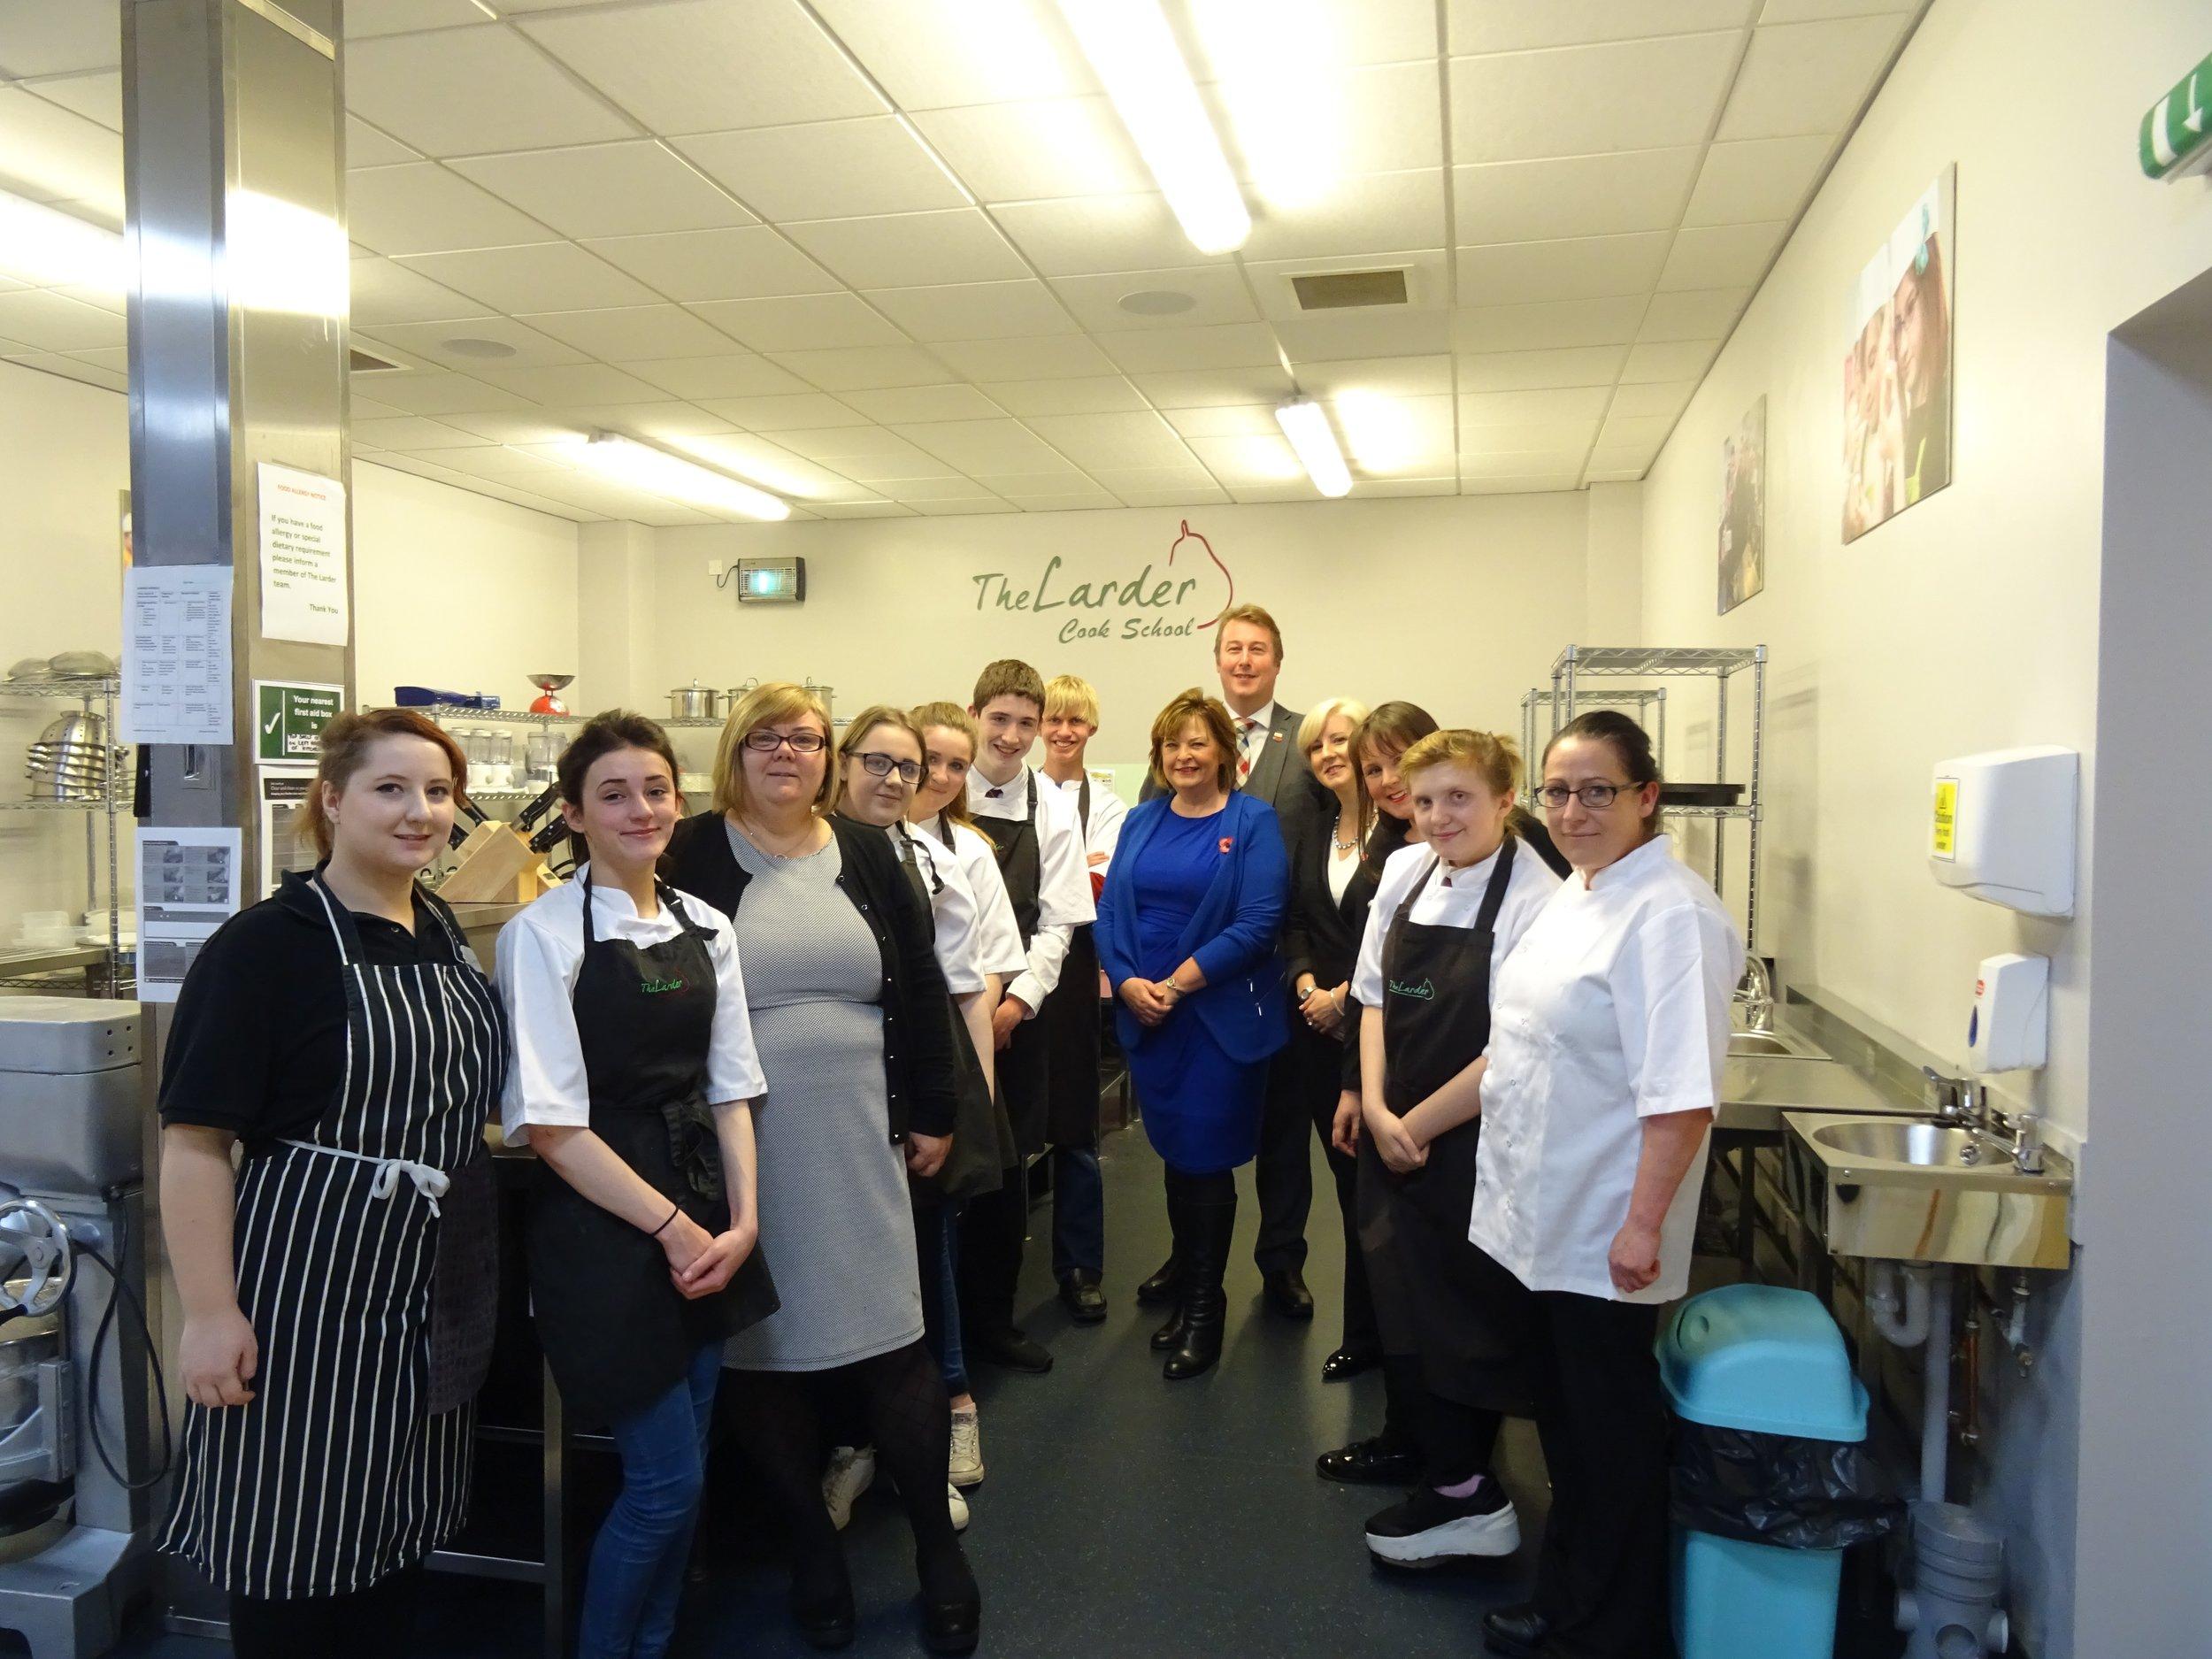 Fiona Hyslop MSP and Hannah Bardell MP visiting The Larder on Friday 11th November.